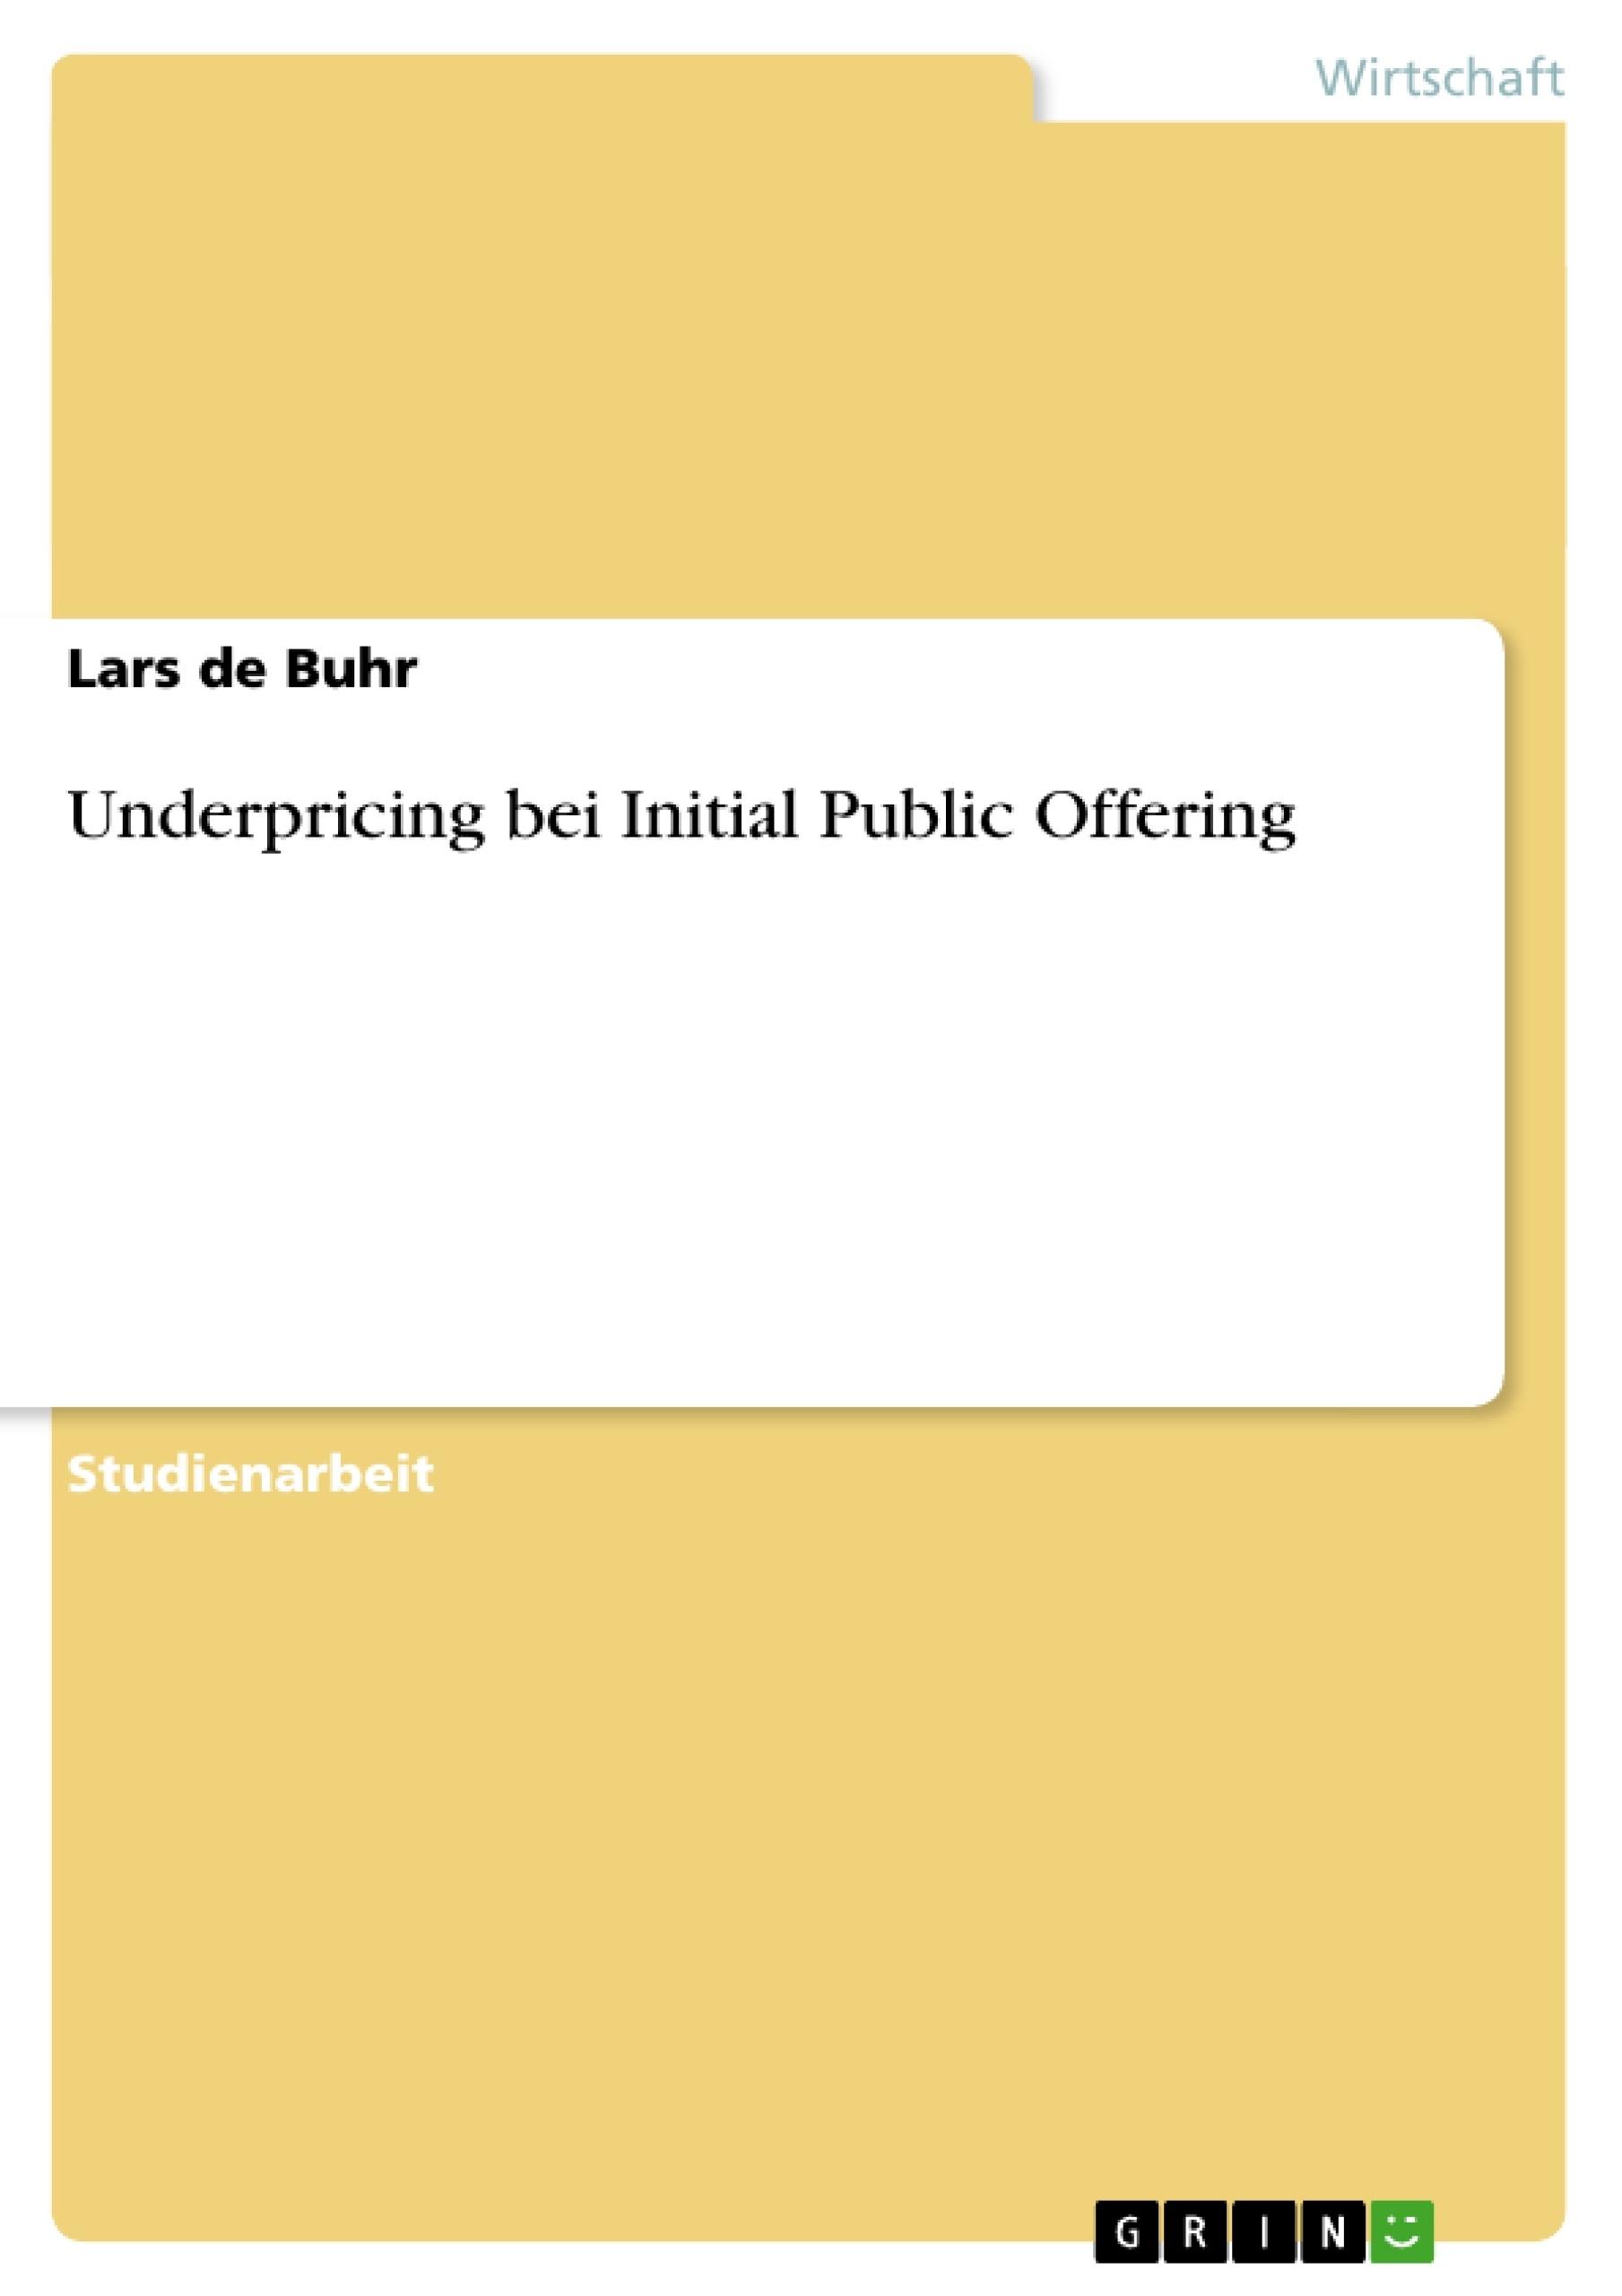 Titel: Underpricing bei Initial Public Offering